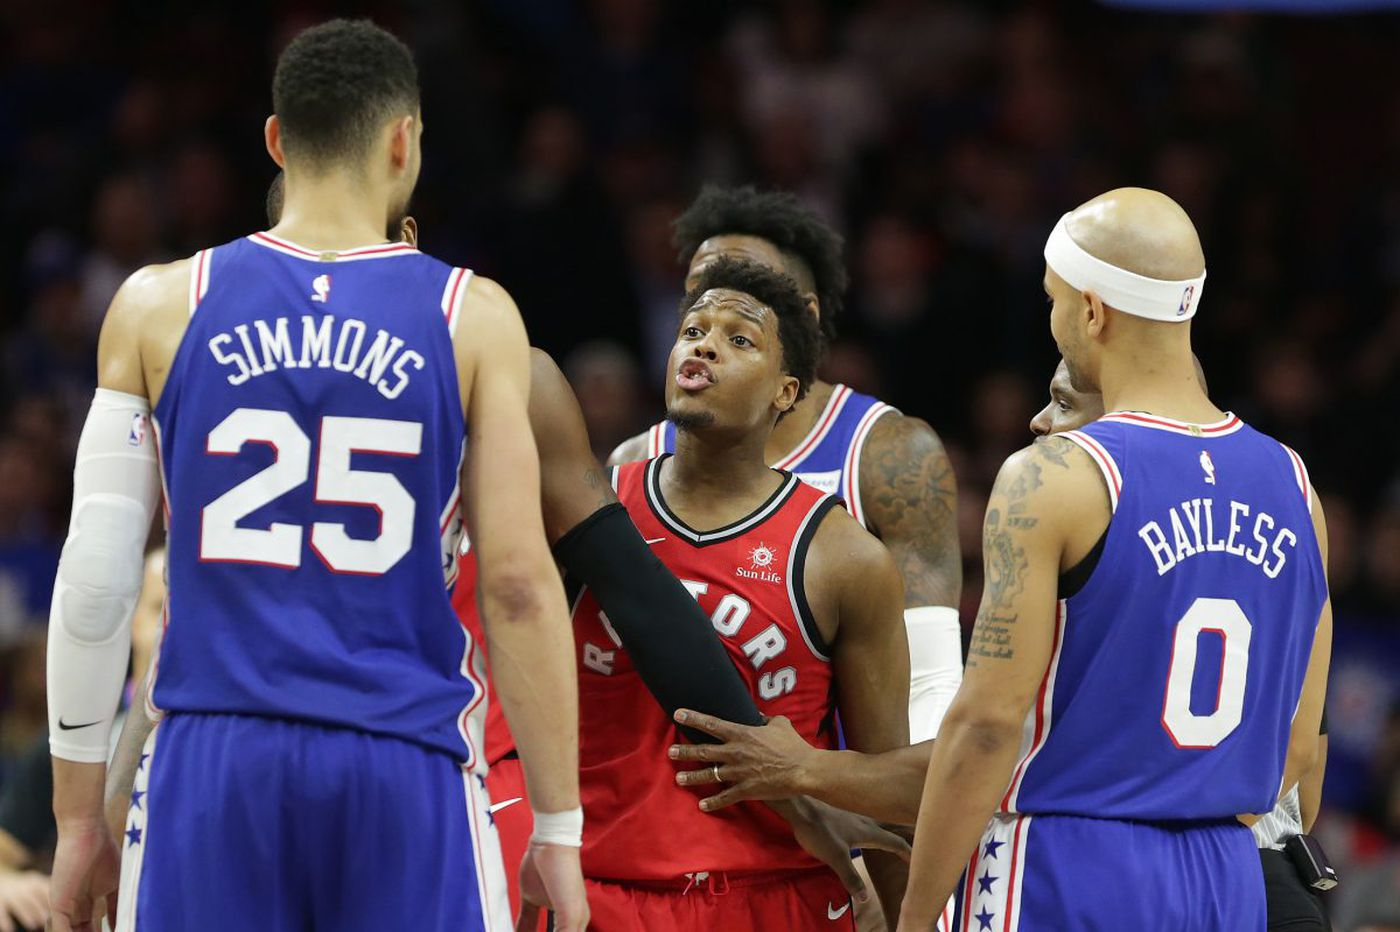 Sixers-Raptors observations, best and worst awards: Ben Simmons' grit, Joel Embiid's dominance, Toronto's lackluster effort